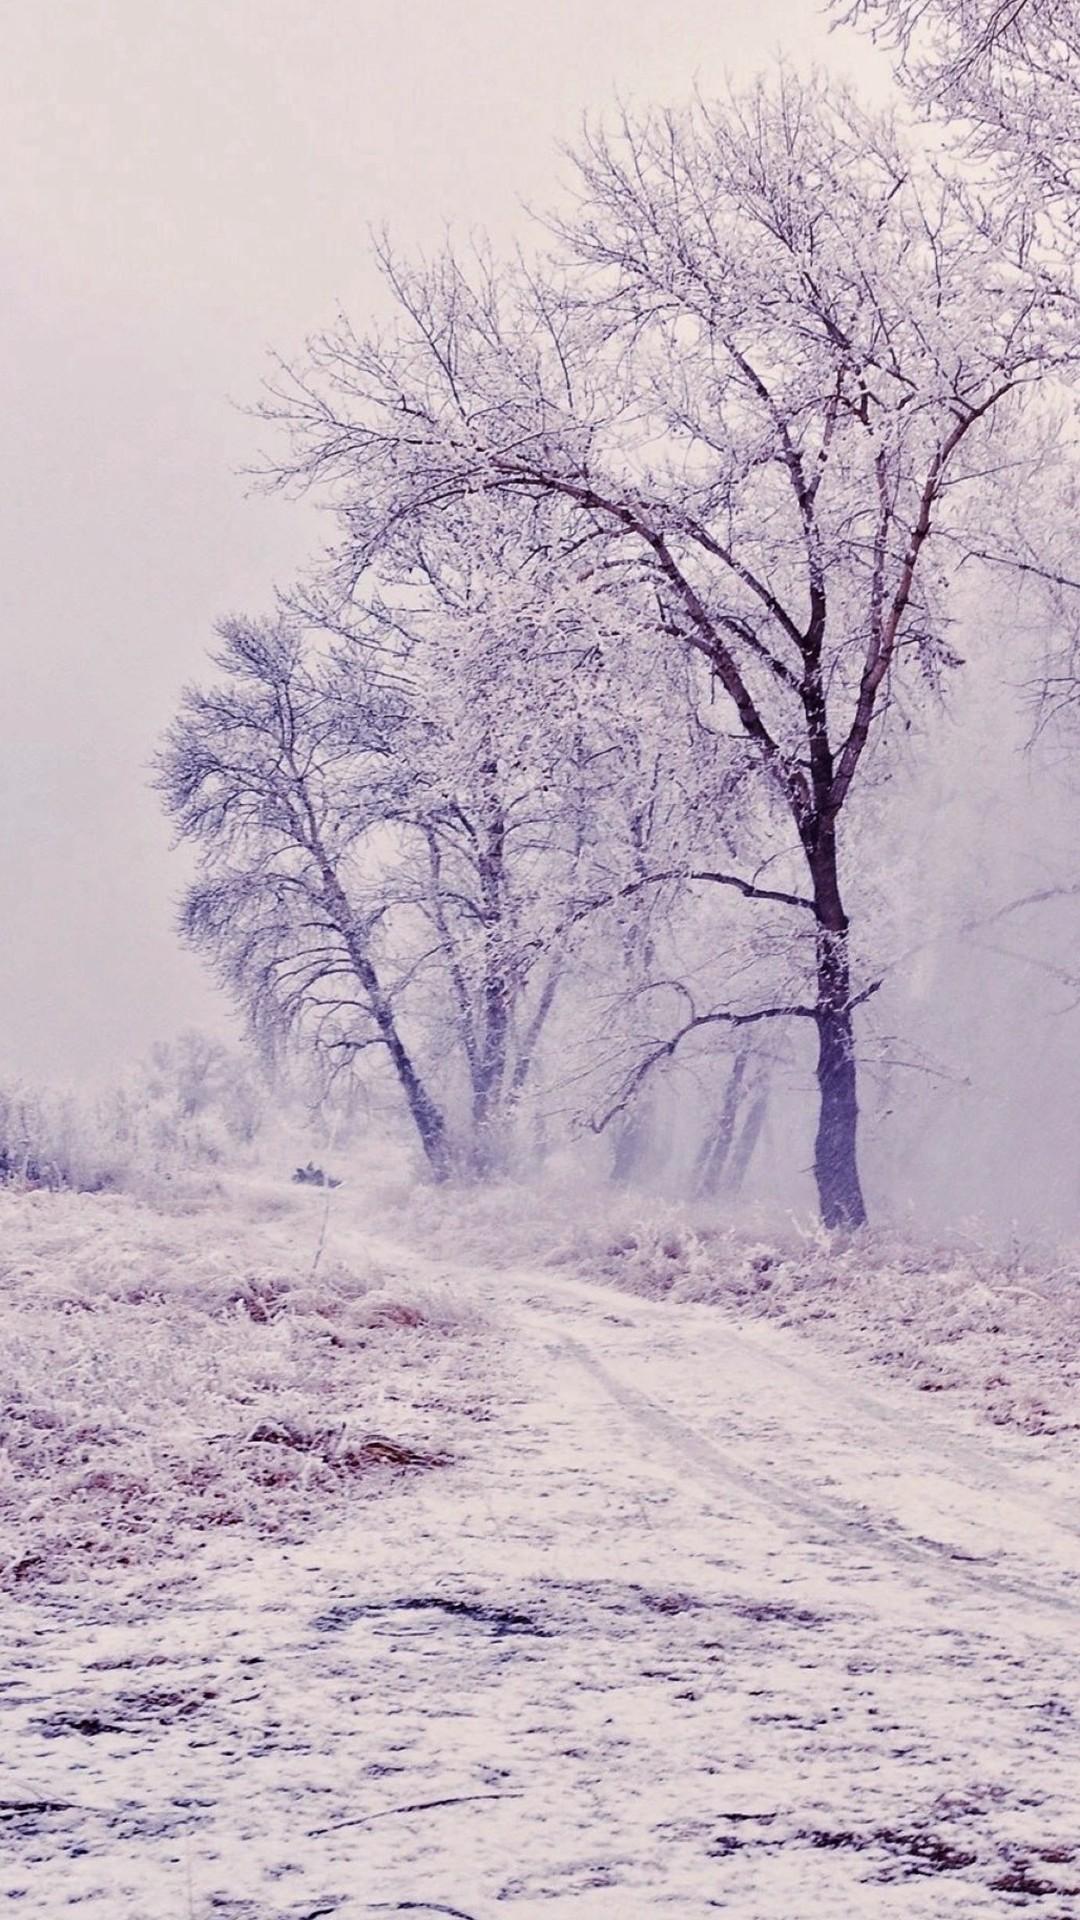 Winter Path Trees Landscape iPhone 6 wallpaper